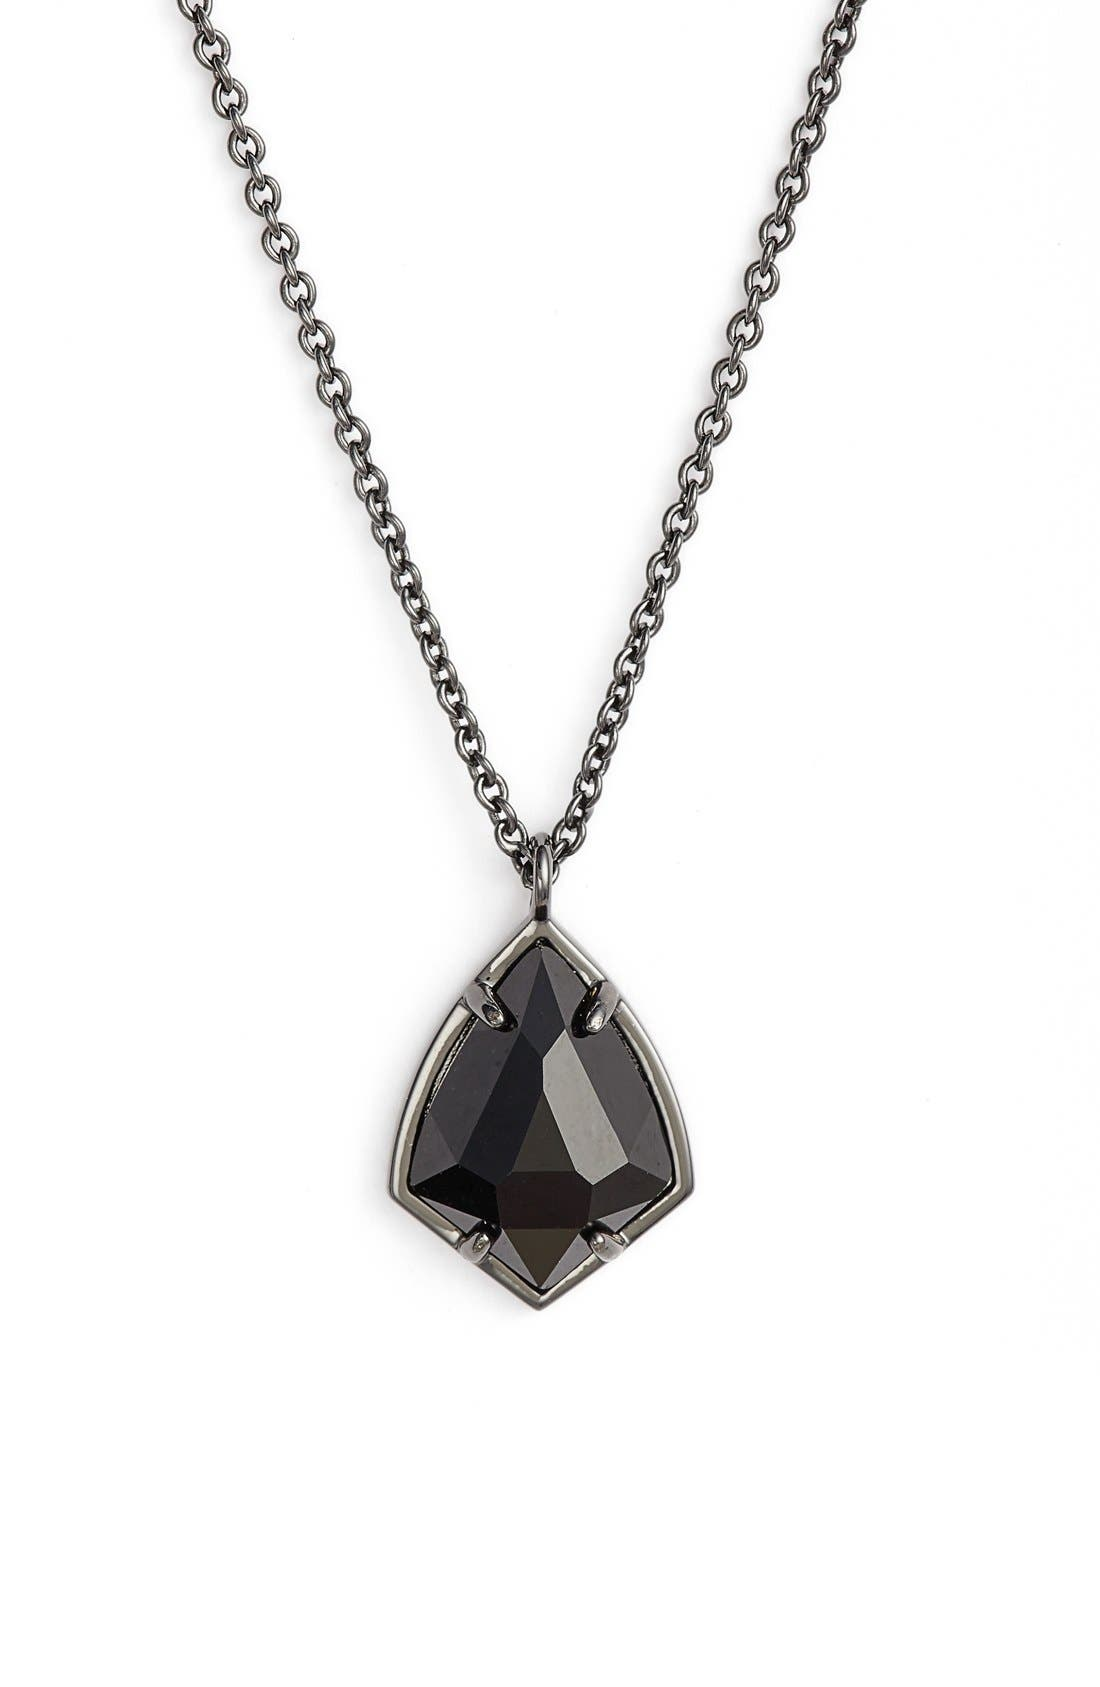 Kendra Scott 'Cory' Semiprecious Stone Pendant Necklace